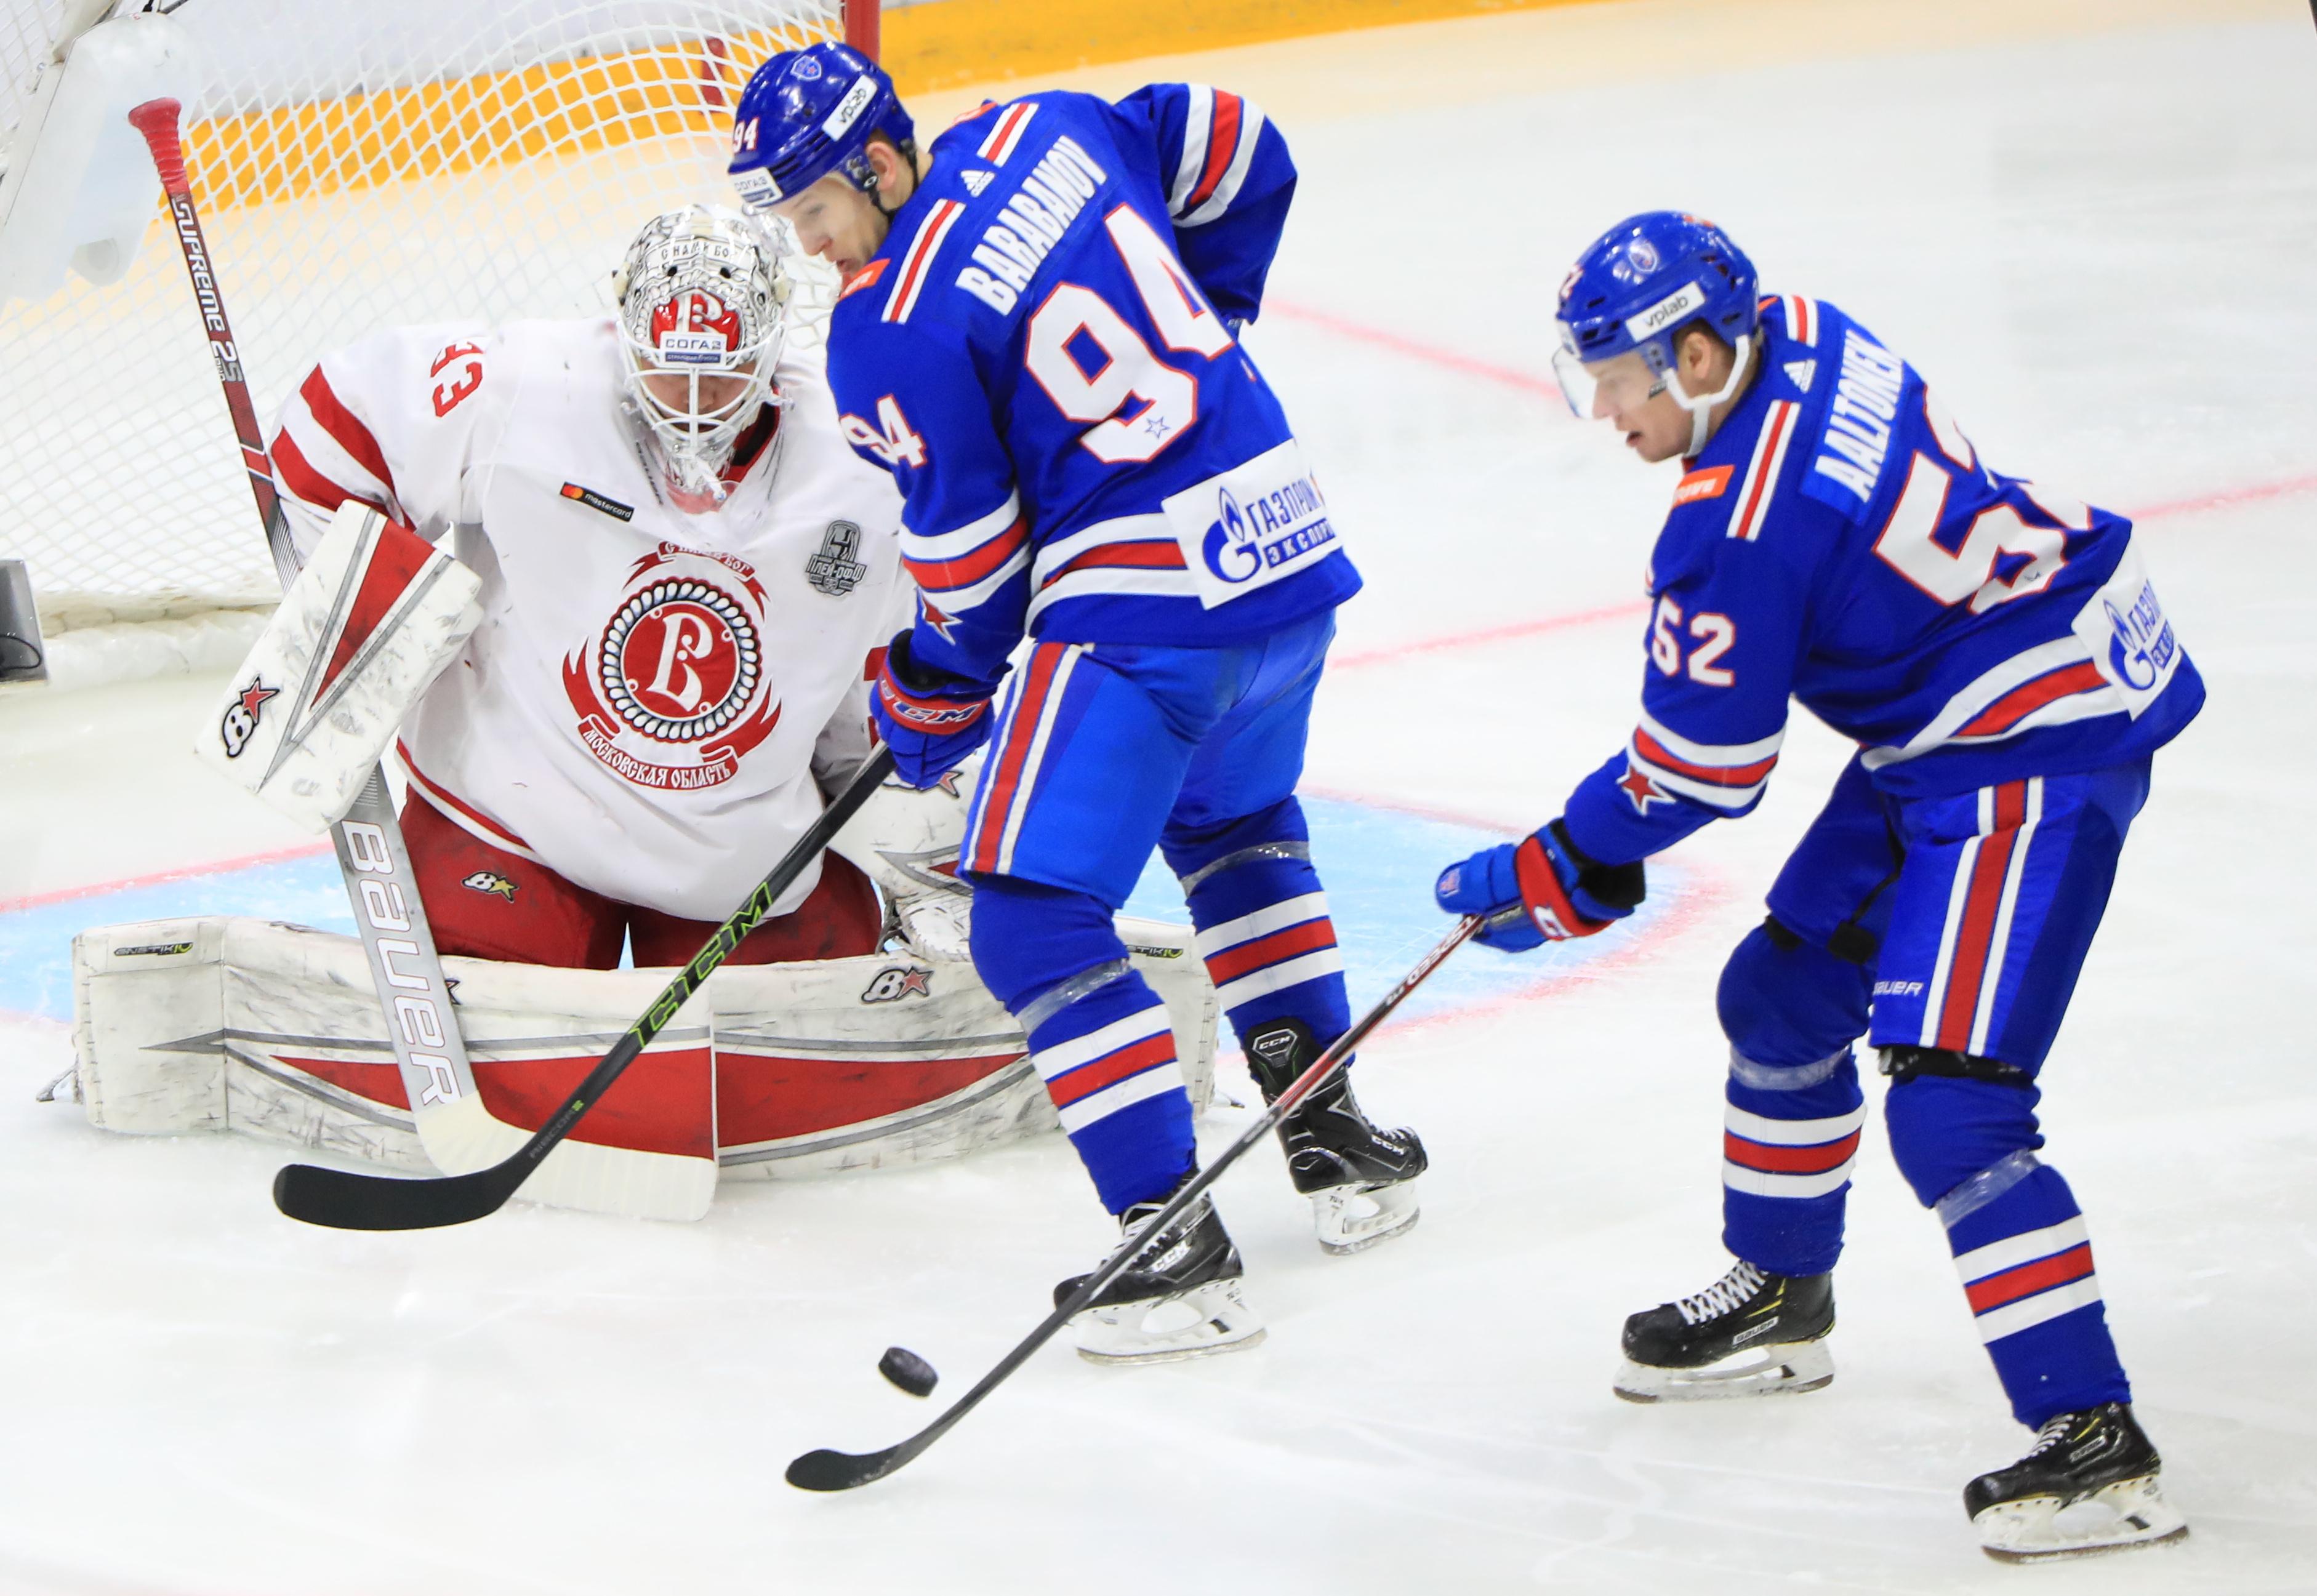 KHL Western Conference Quarterfinal, Leg 1: SKA St Petersburg vs Vityaz Moscow Region